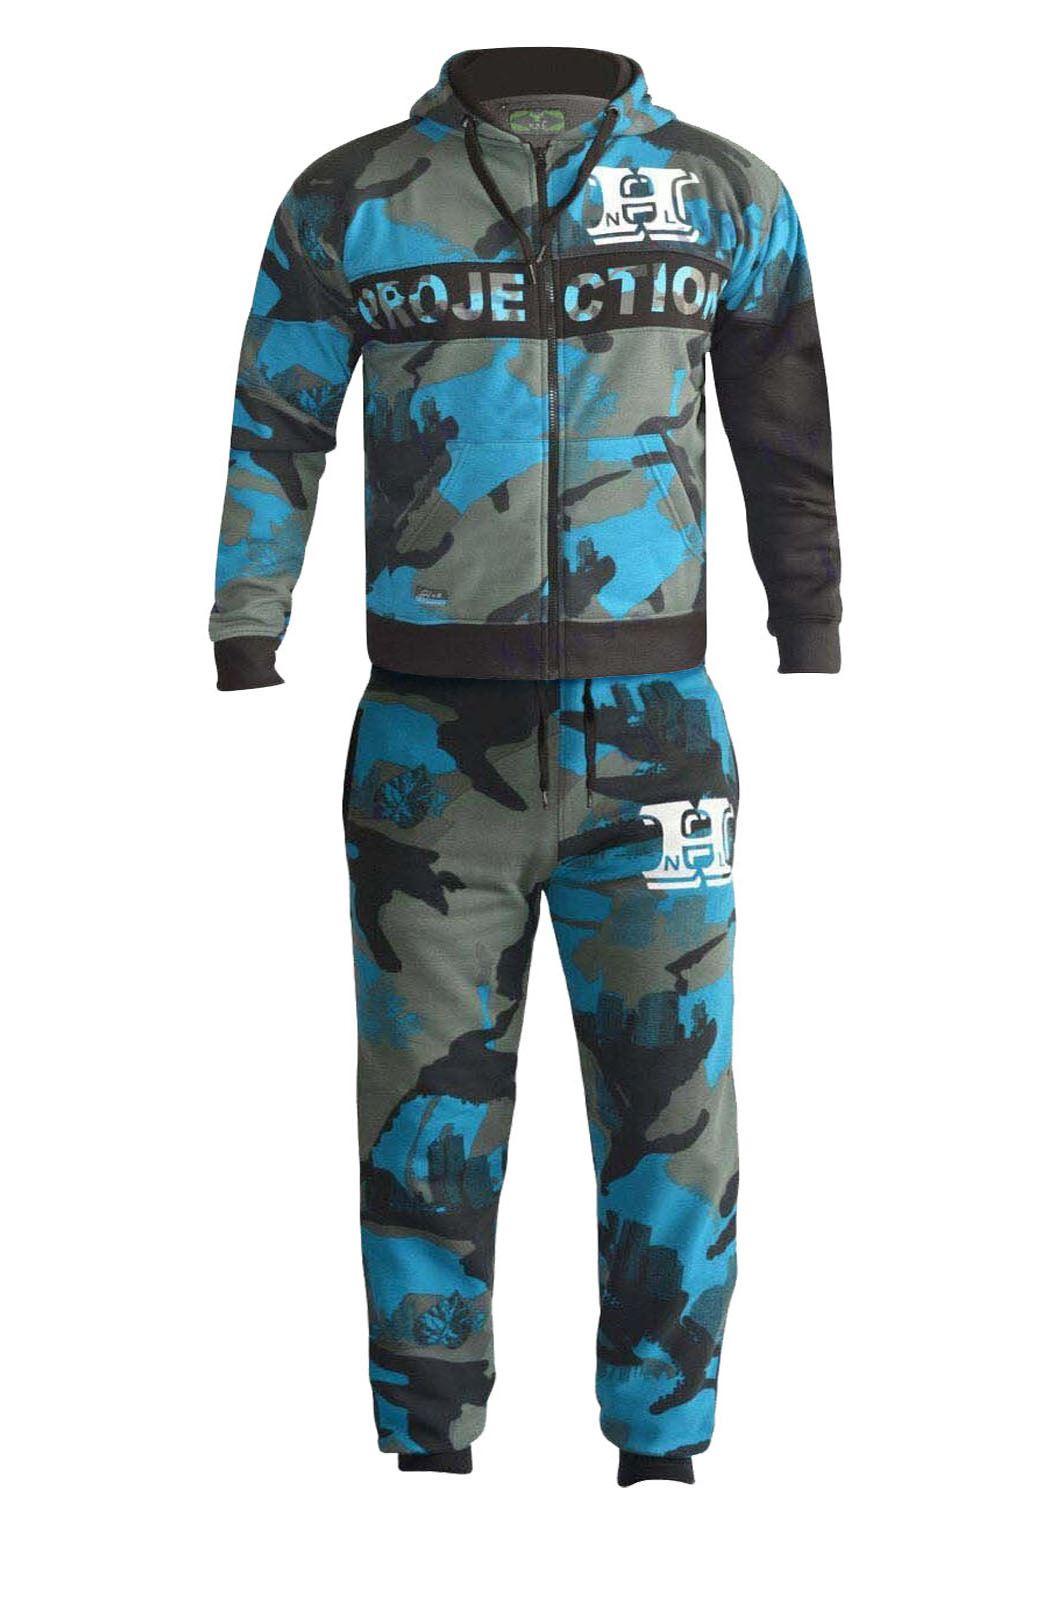 new mens boys designer zipped top bottoms jogging suits tracksuits s xl